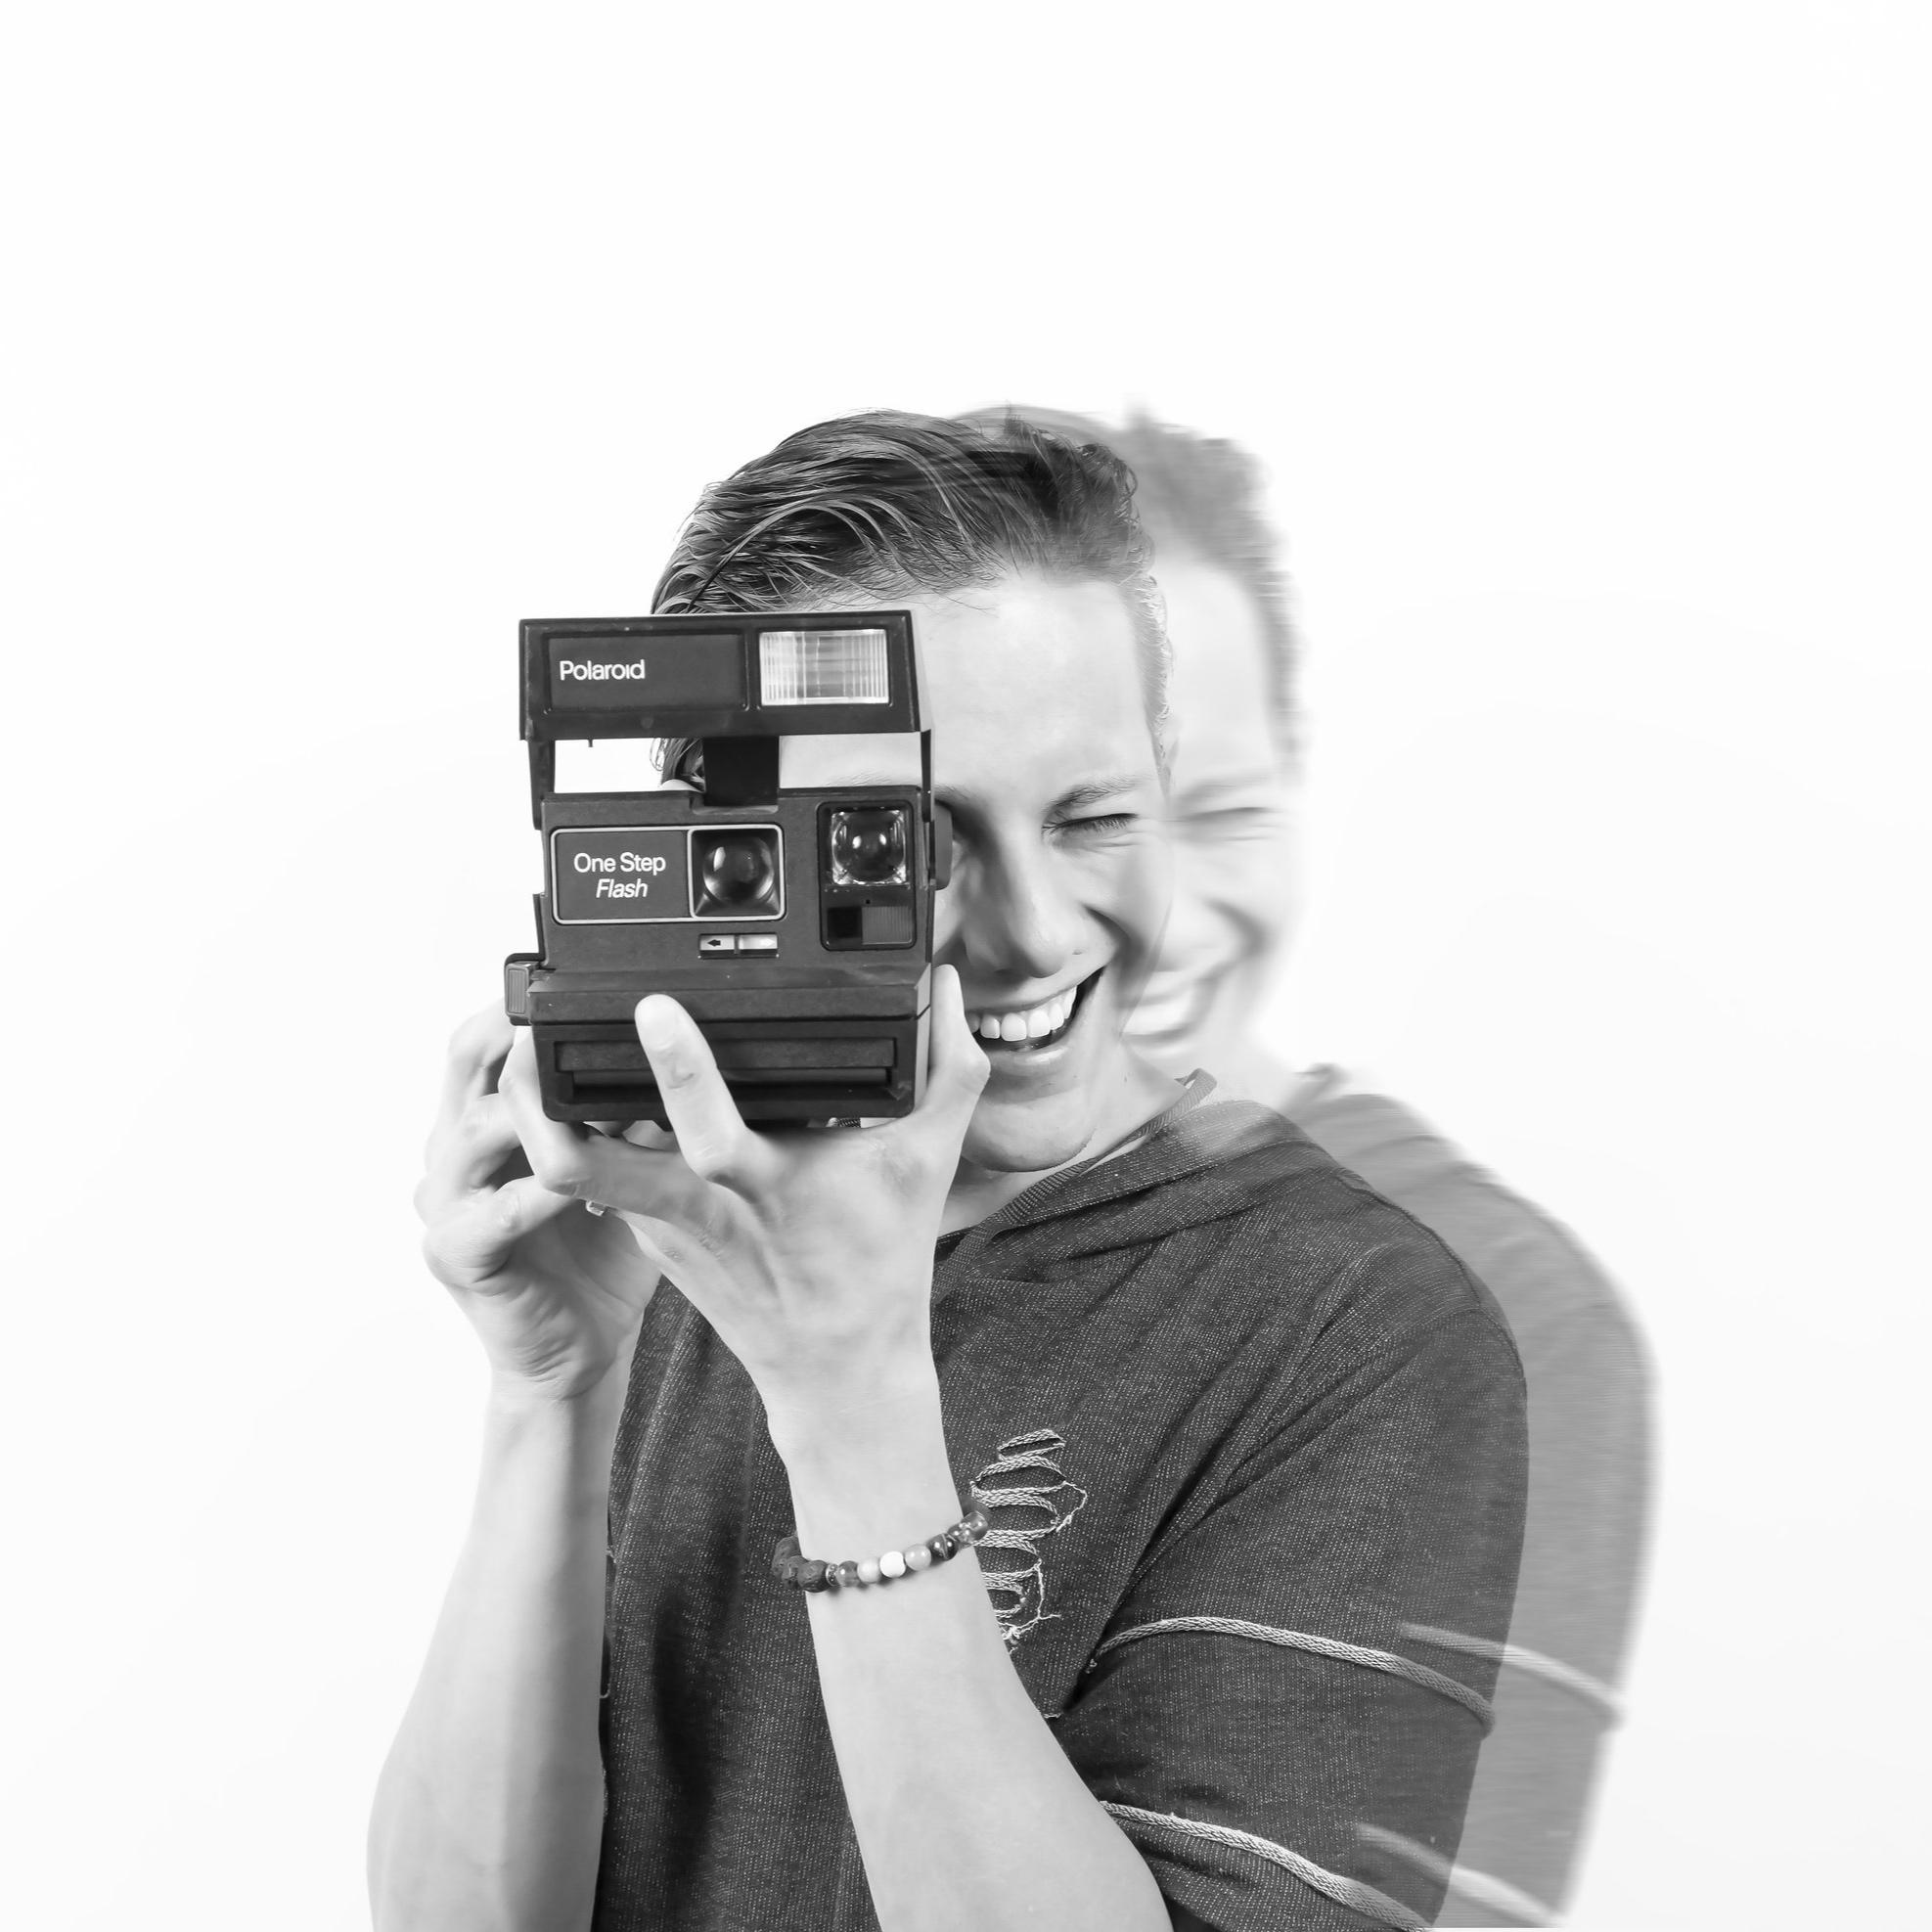 Ivan Garzon - ABOUT THE PHOTOGRAPHER